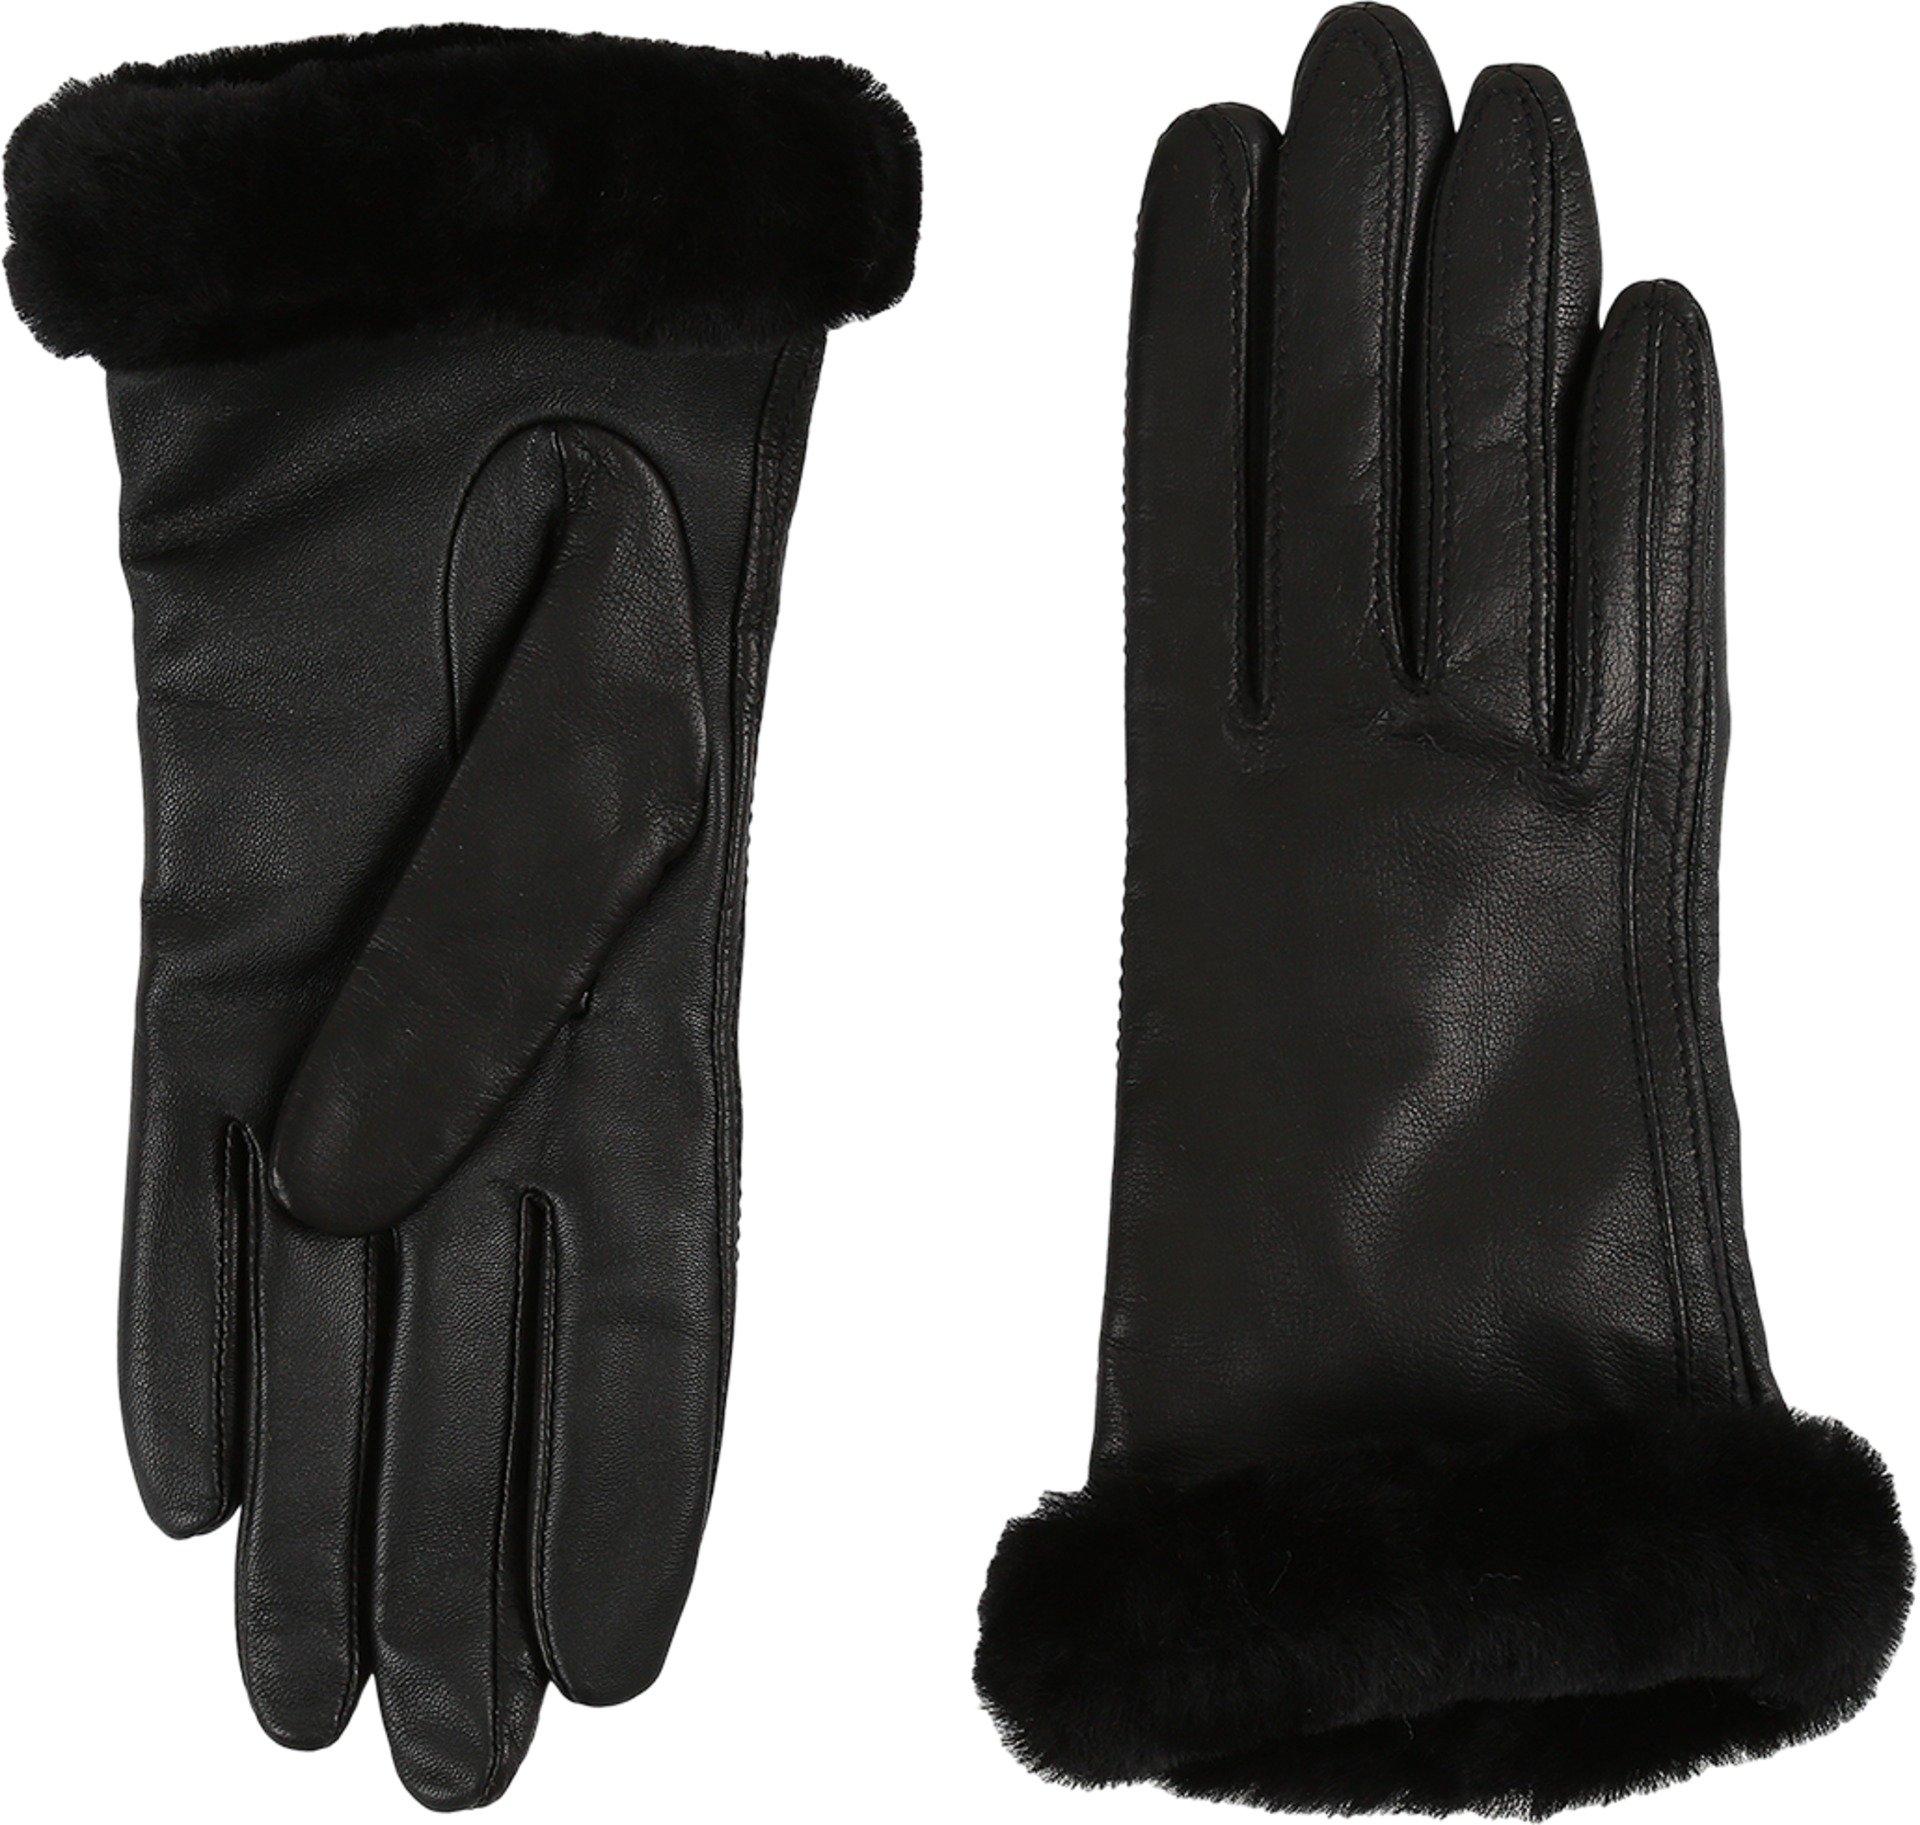 UGG Women's Classic Leather Smart Glove Black LG